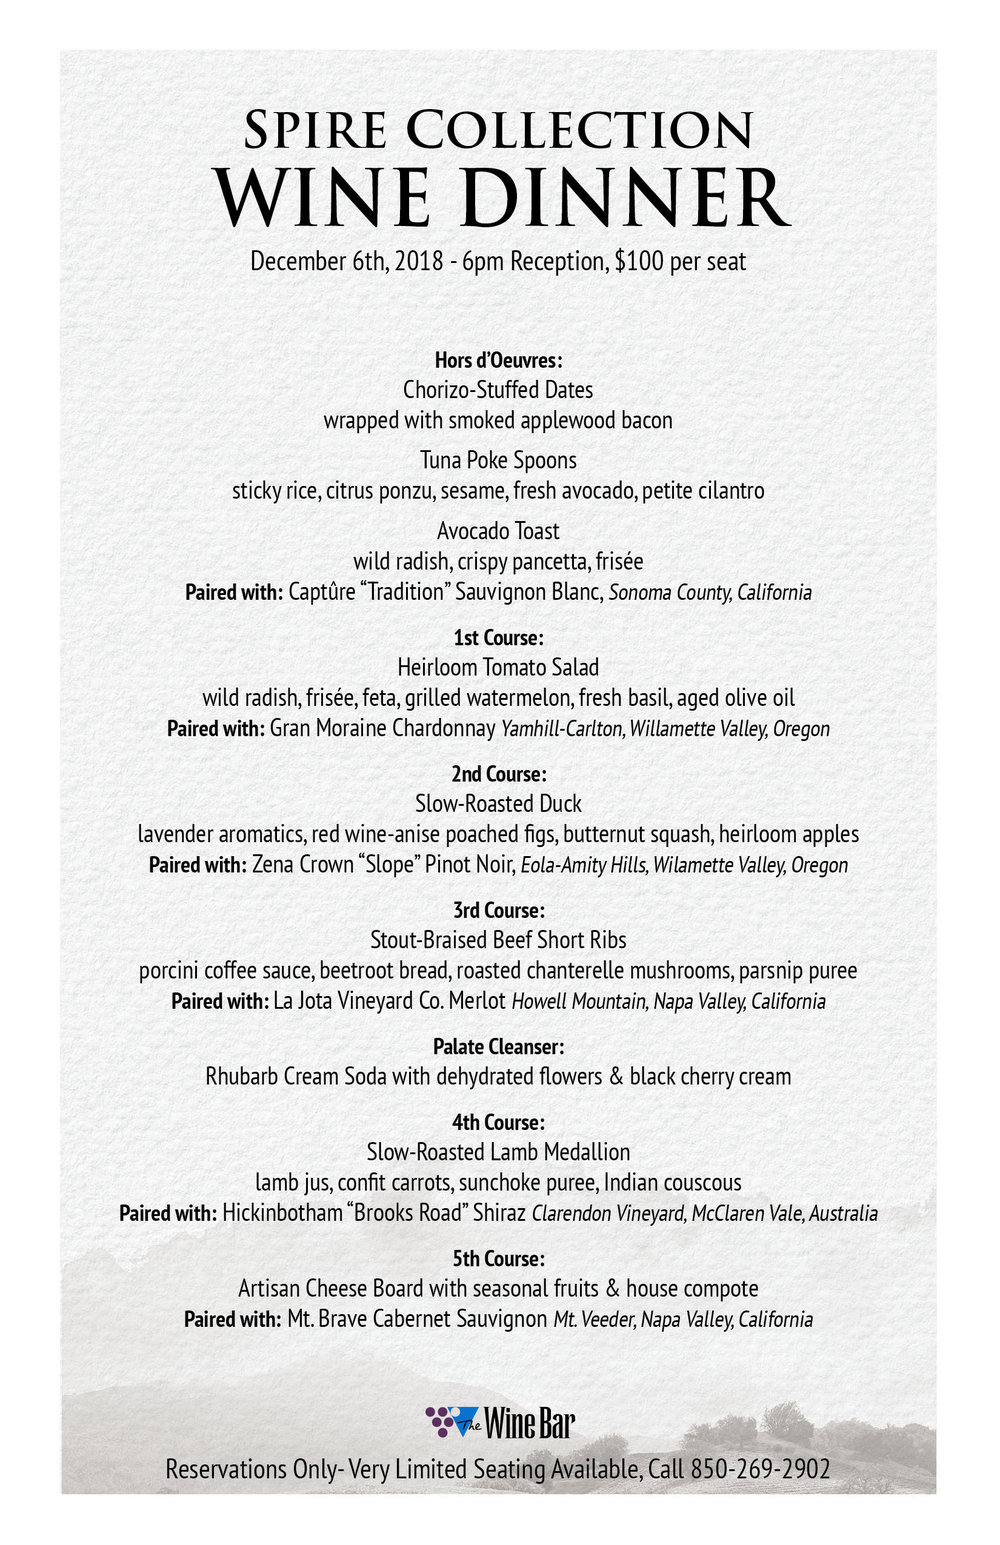 Spire Dinner Flyer_Destin2 copy.jpg